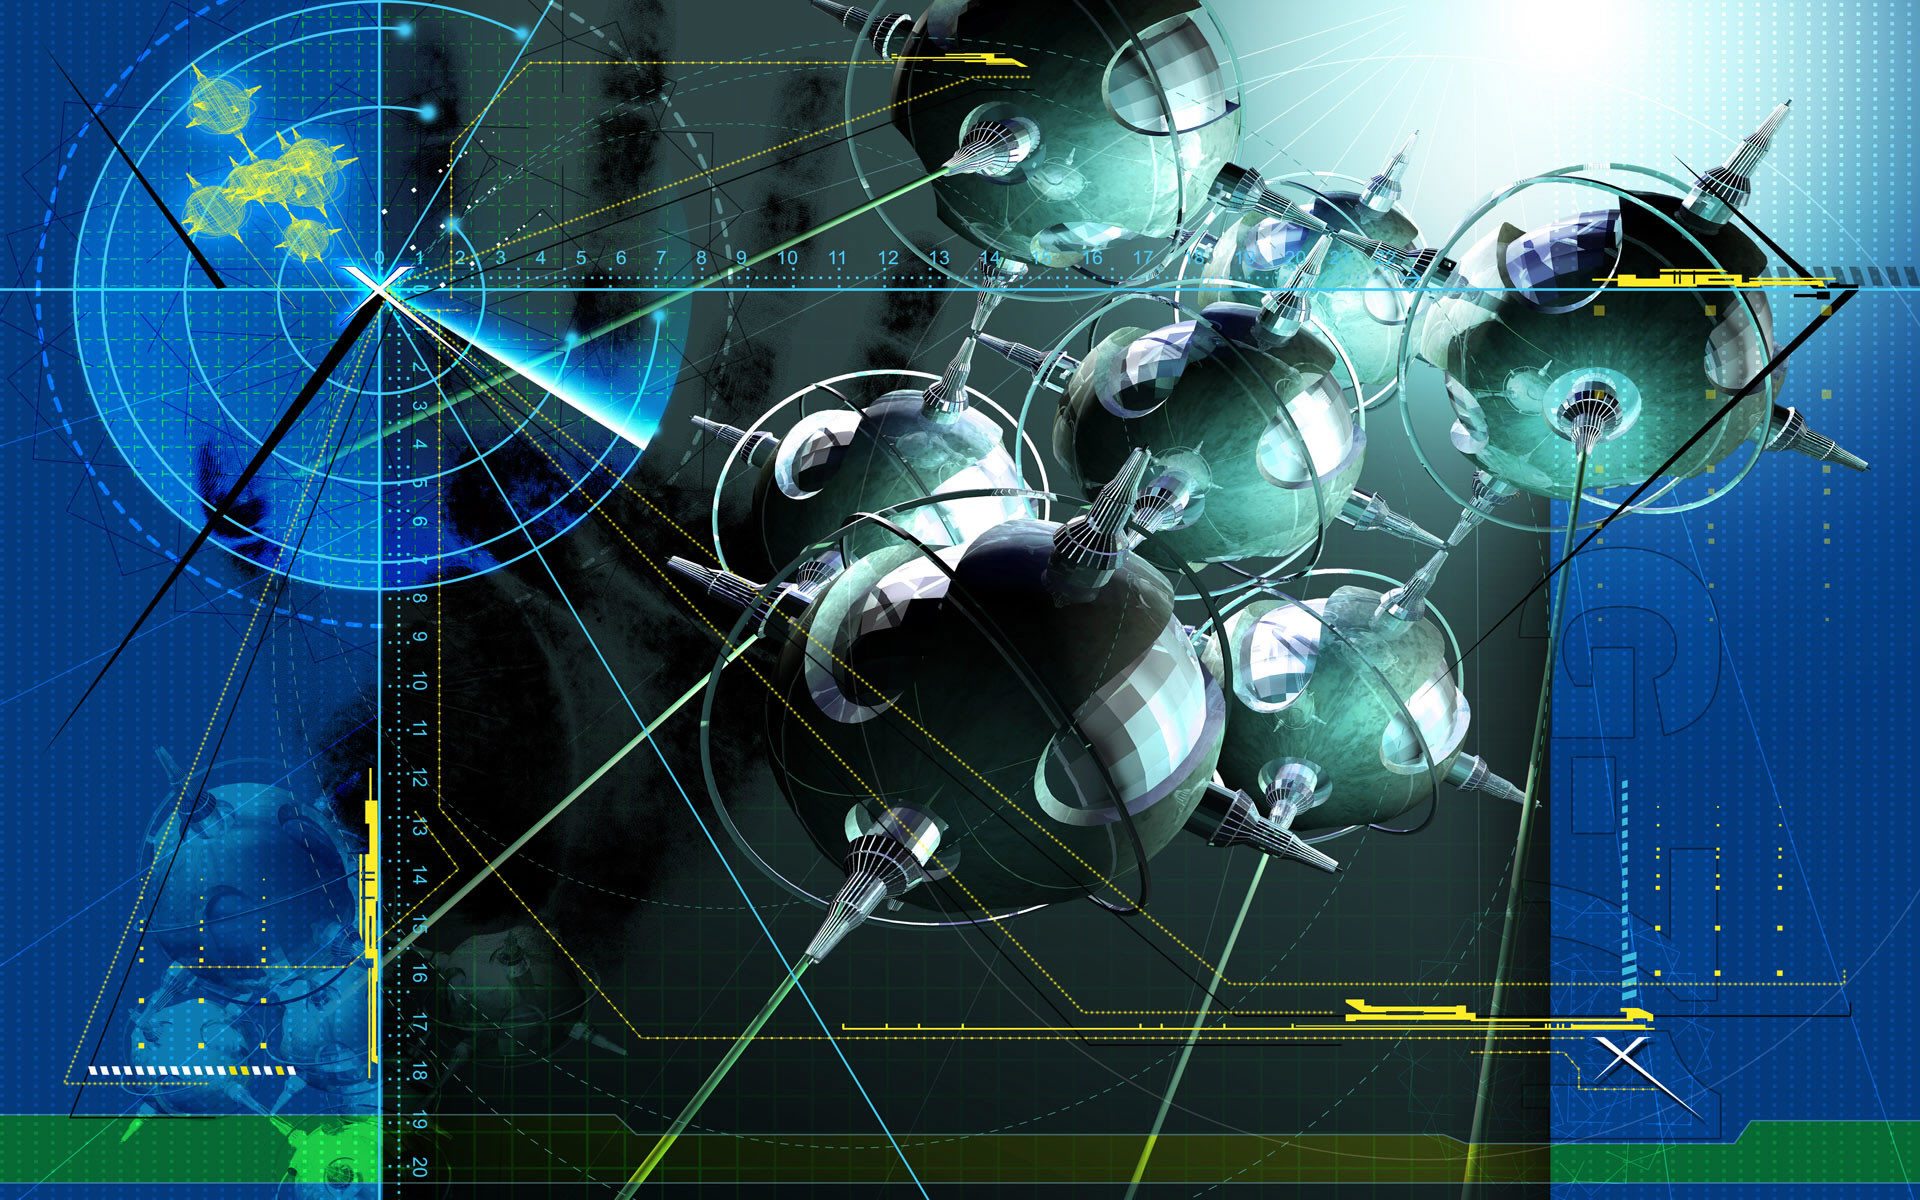 3D Creative Sci-Fi Widescreen Wallpaper Wallpapers – HD Wallpapers .